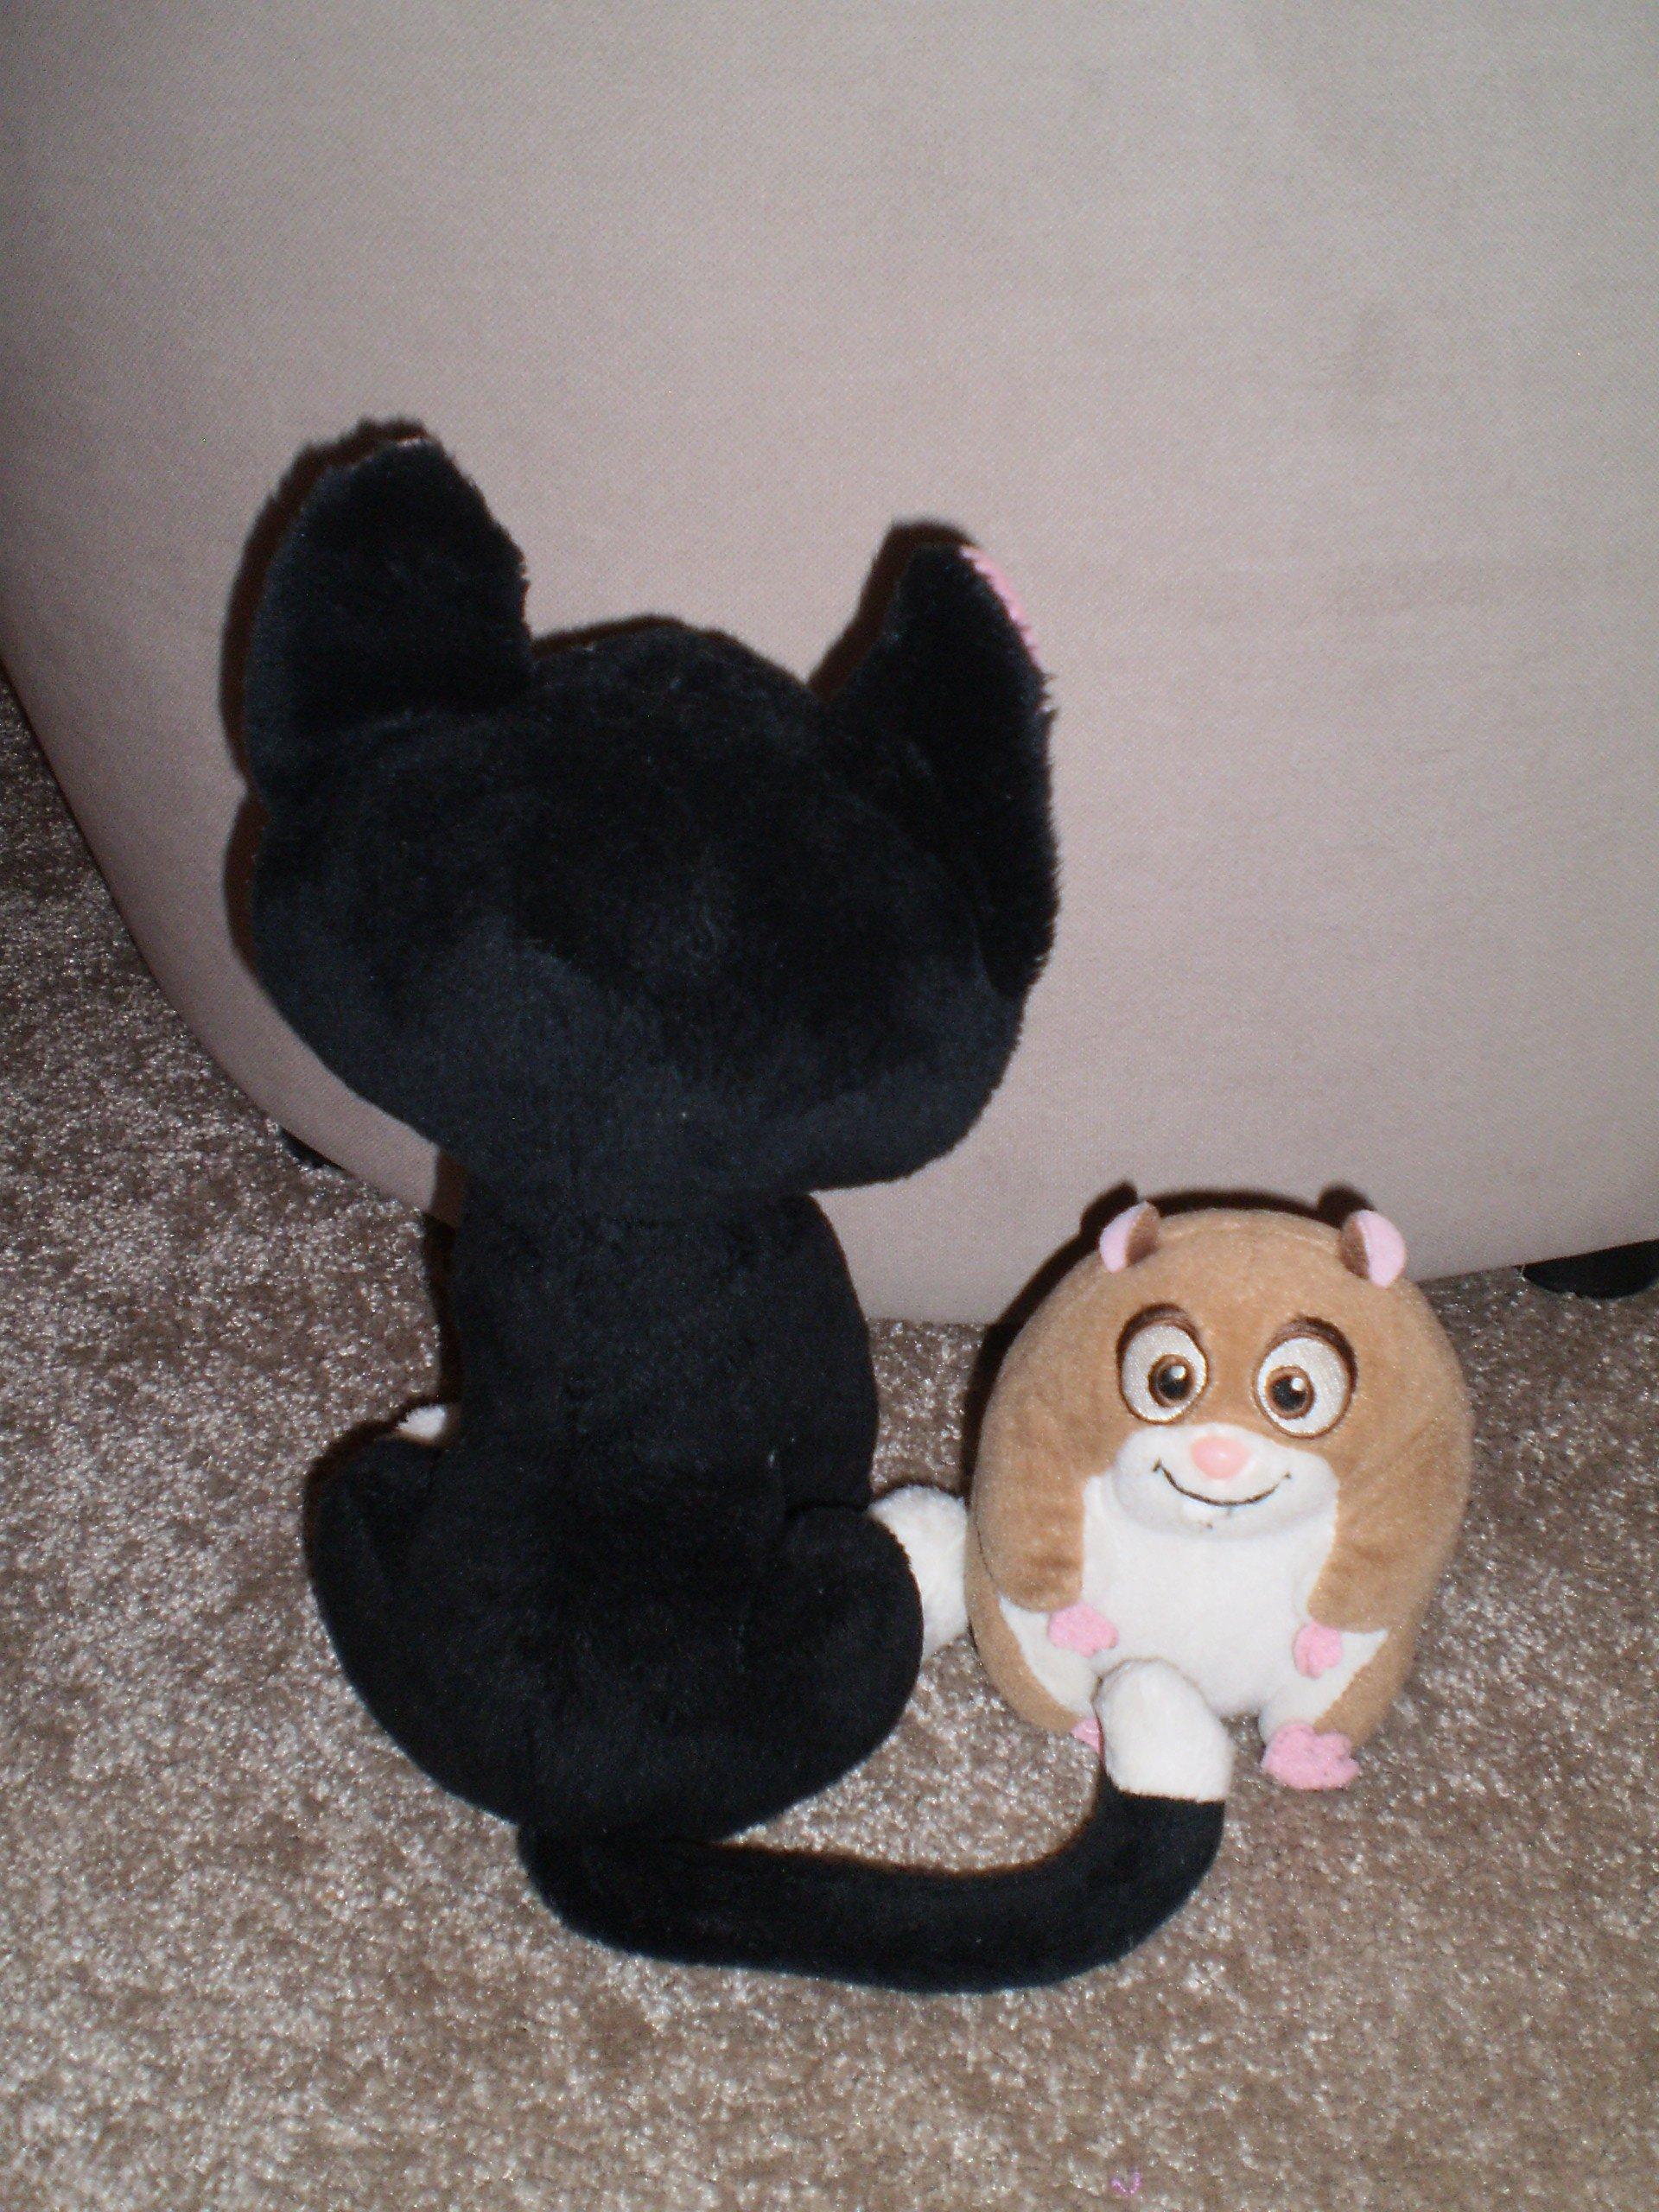 Pies Piorun Kot Marlenka 27cm Adylla 13cm Disney 7246587258